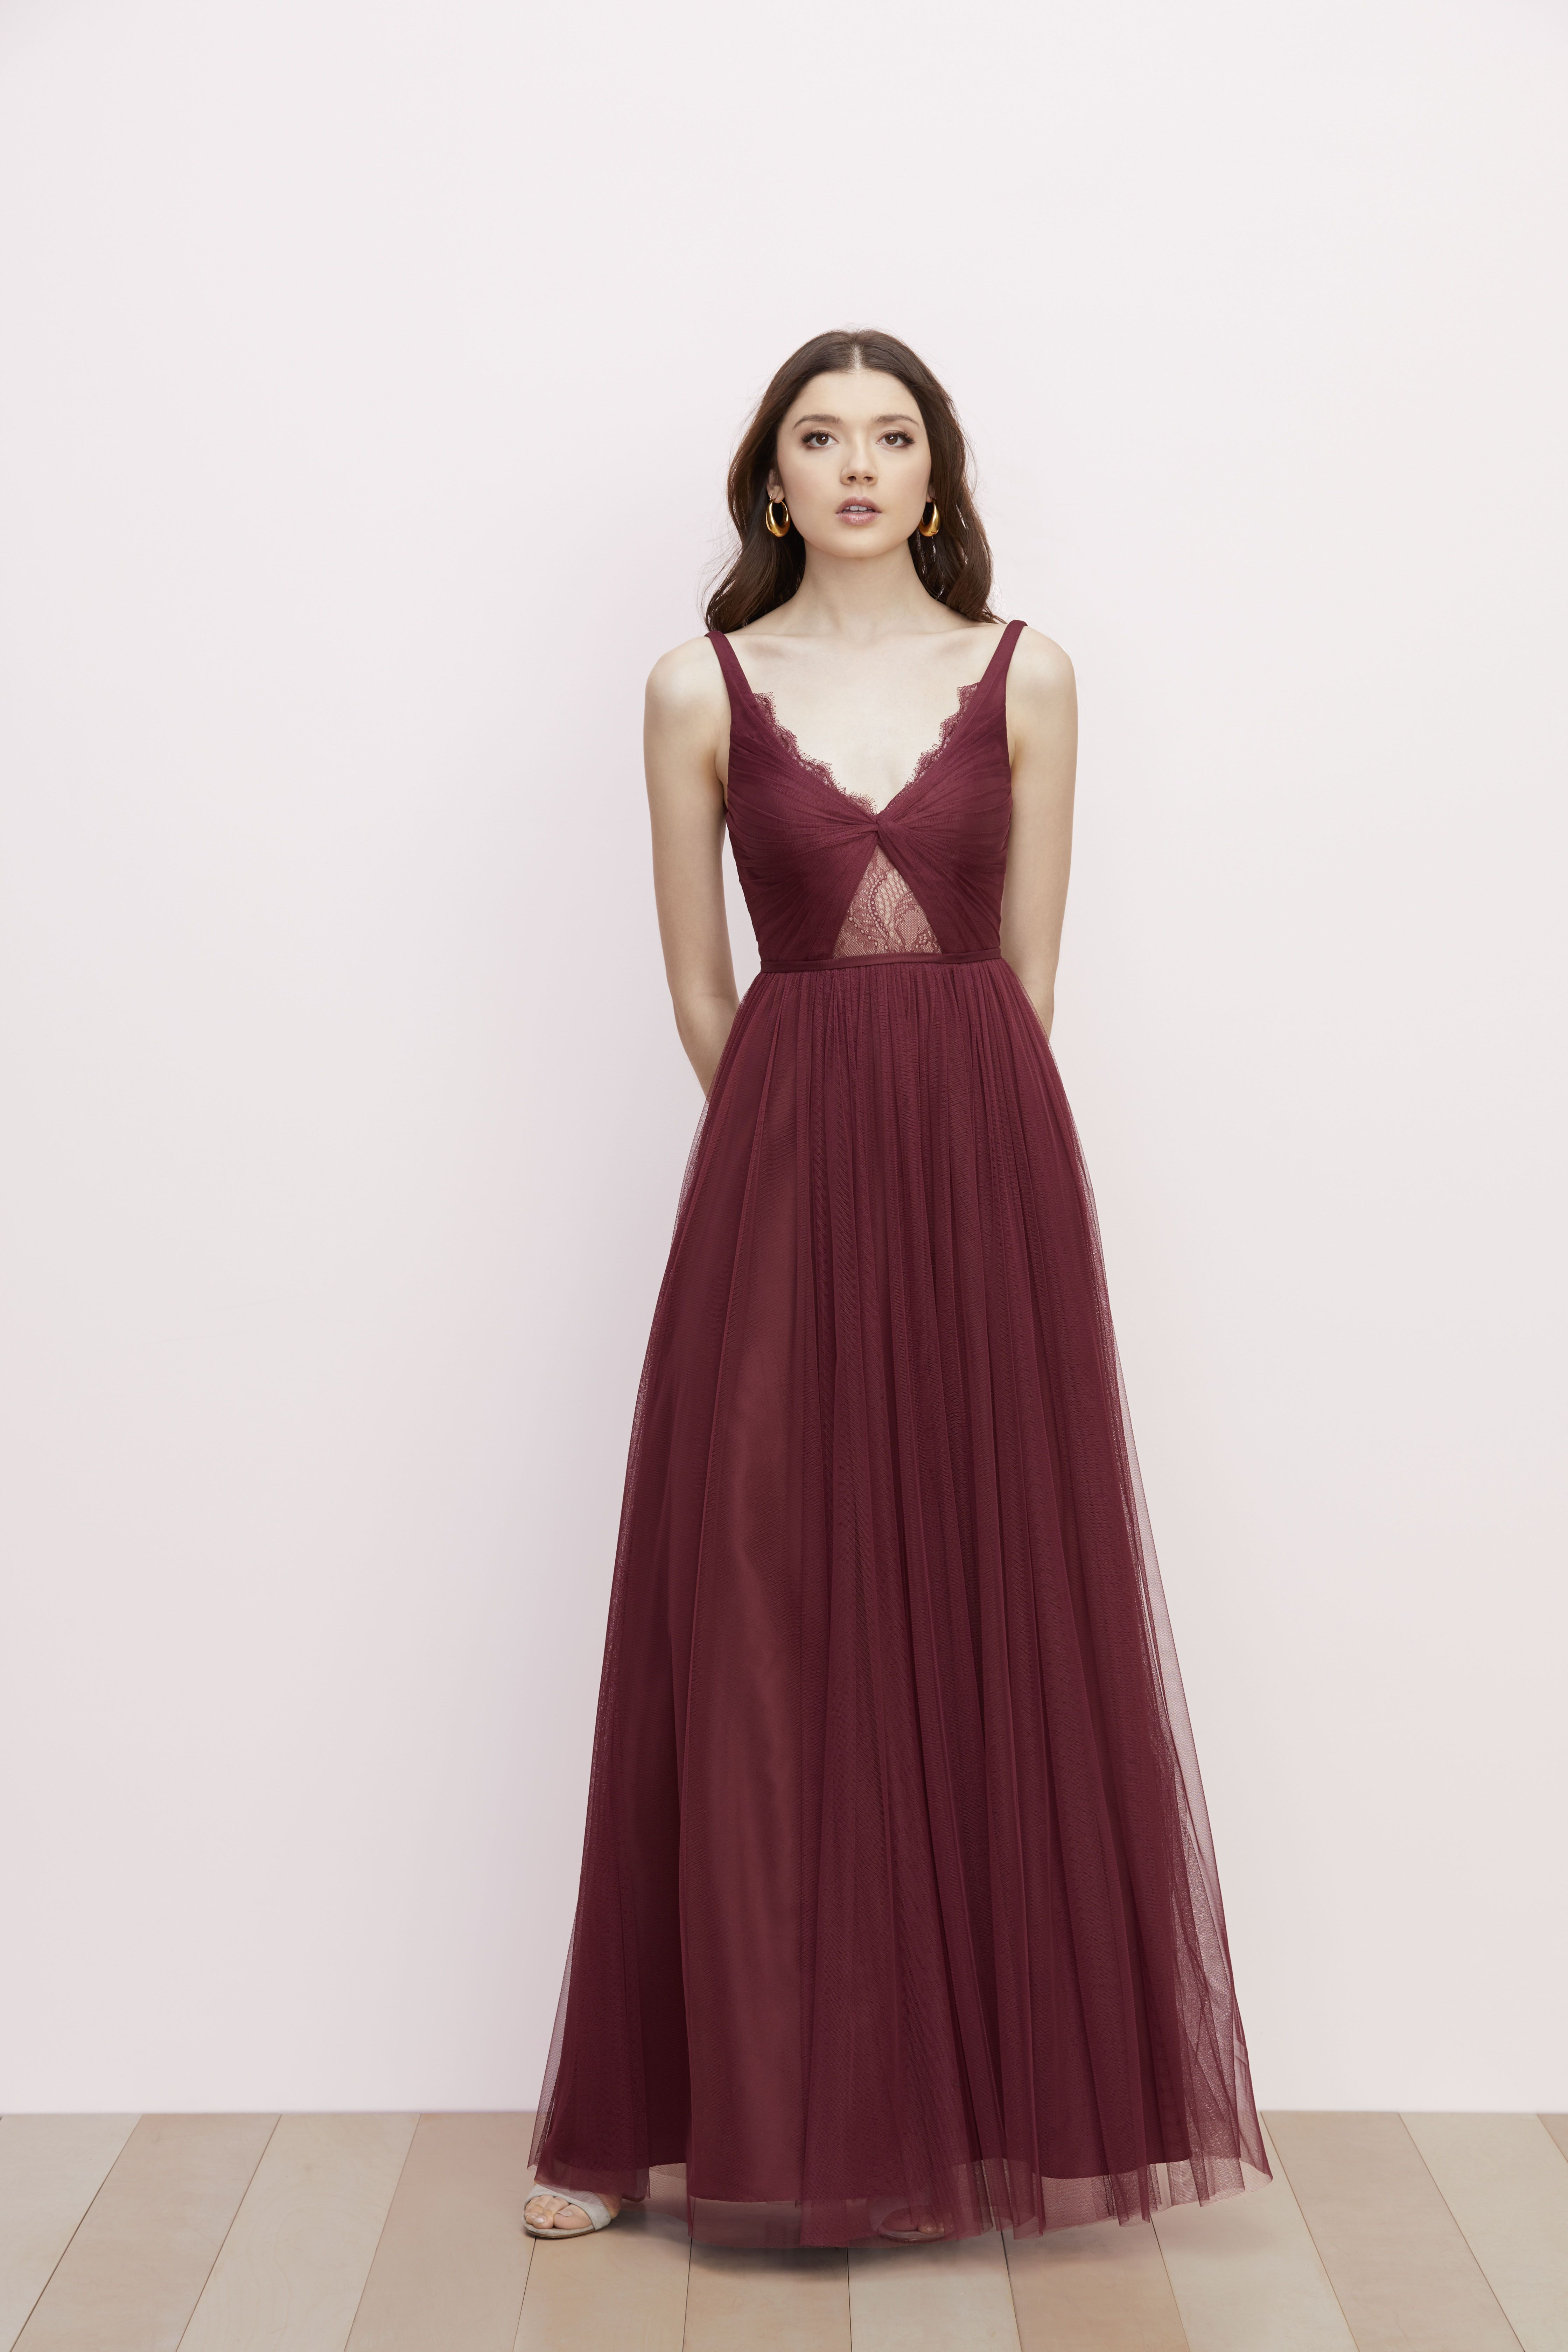 Watters Bridesmaid Dress Dark Wine Red Kyla Watters Bridesmaid Dresses Dresses Simple Prom Dress [ 6720 x 4480 Pixel ]